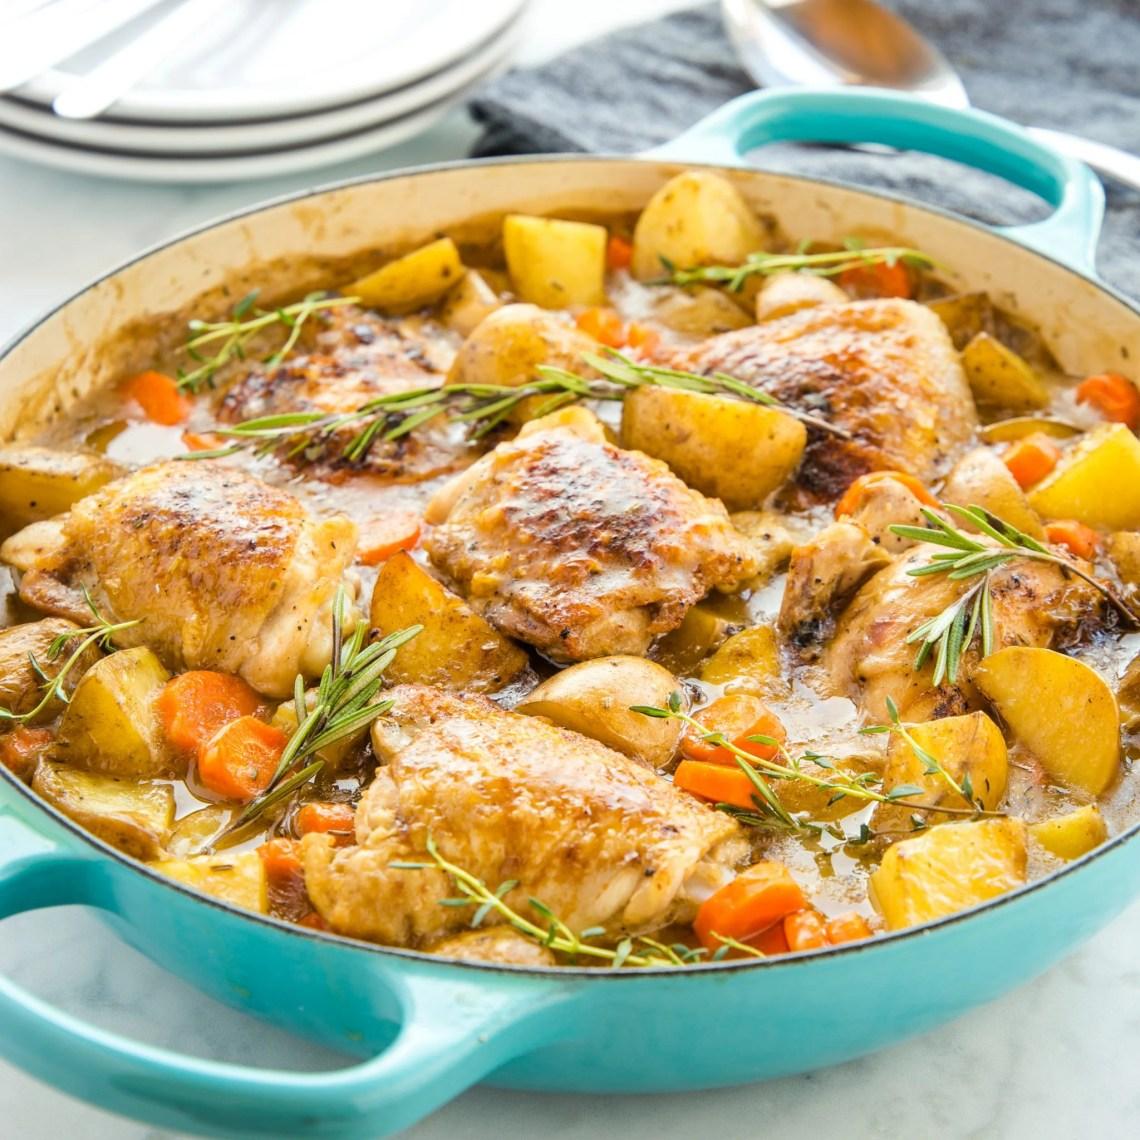 Easy One Pot Roasted Chicken Dinner - The Busy Baker